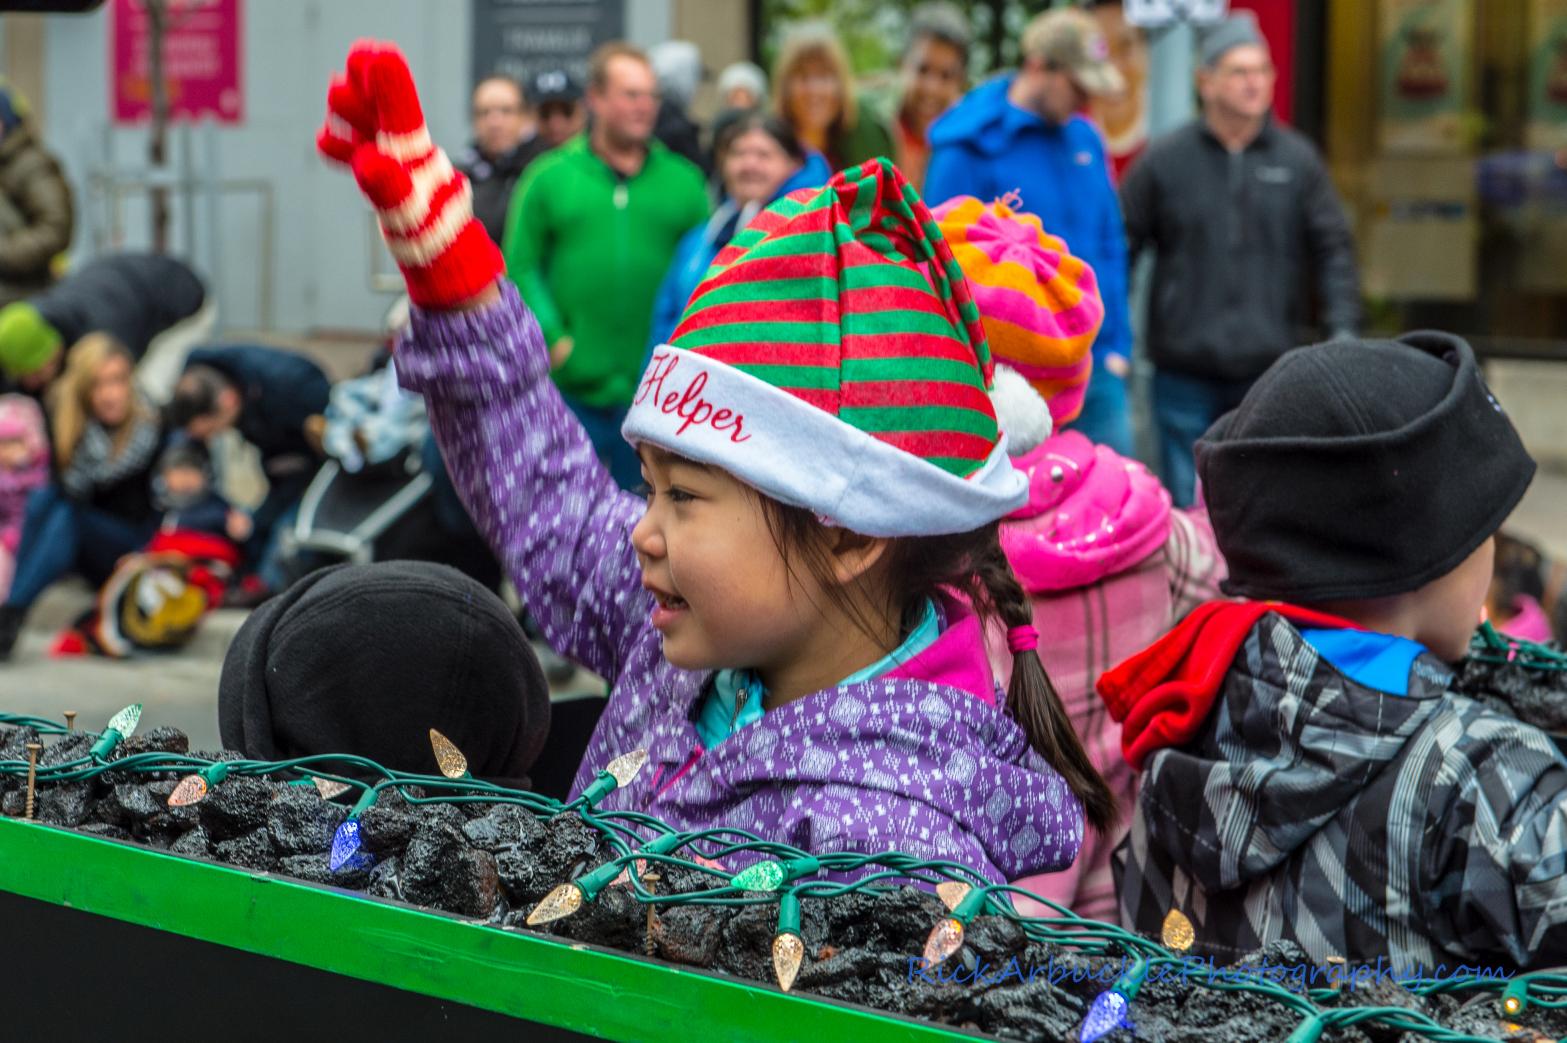 Help Santa Toy Parade 2016 11 19  061